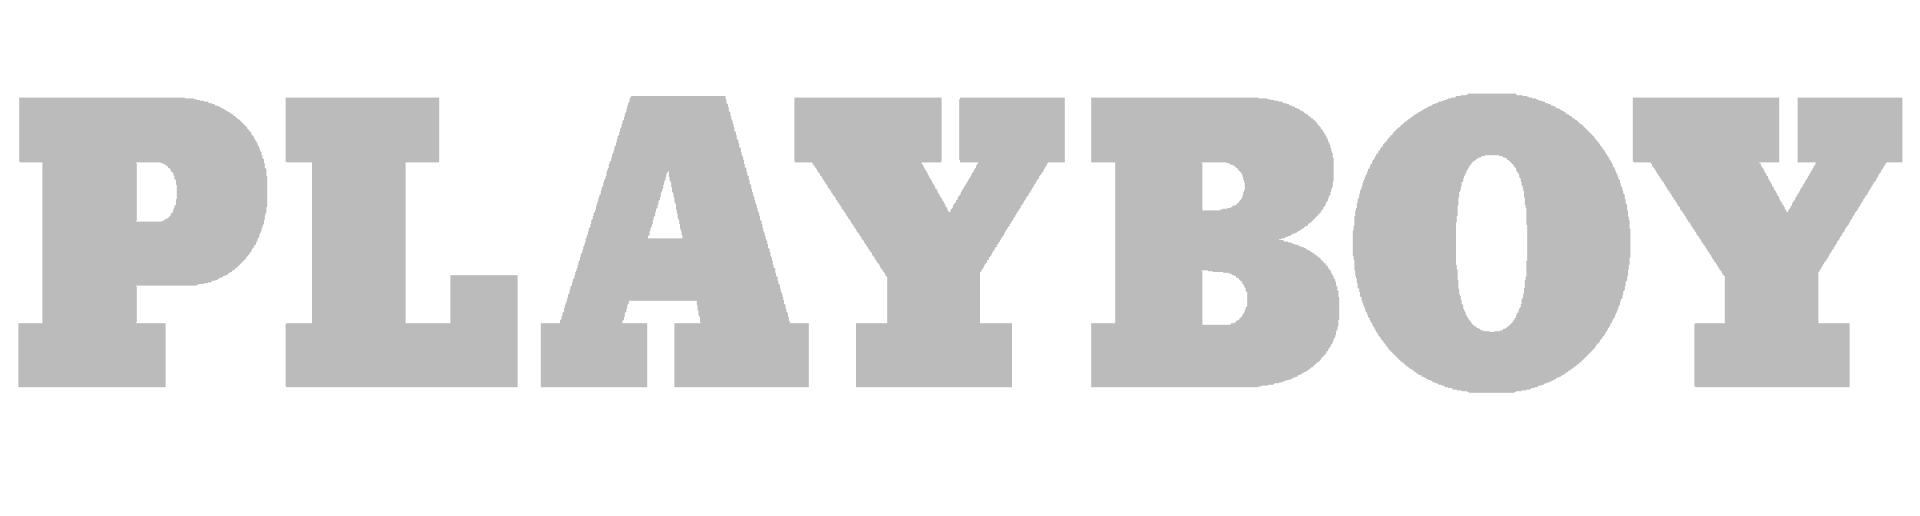 playboy-sima-logo